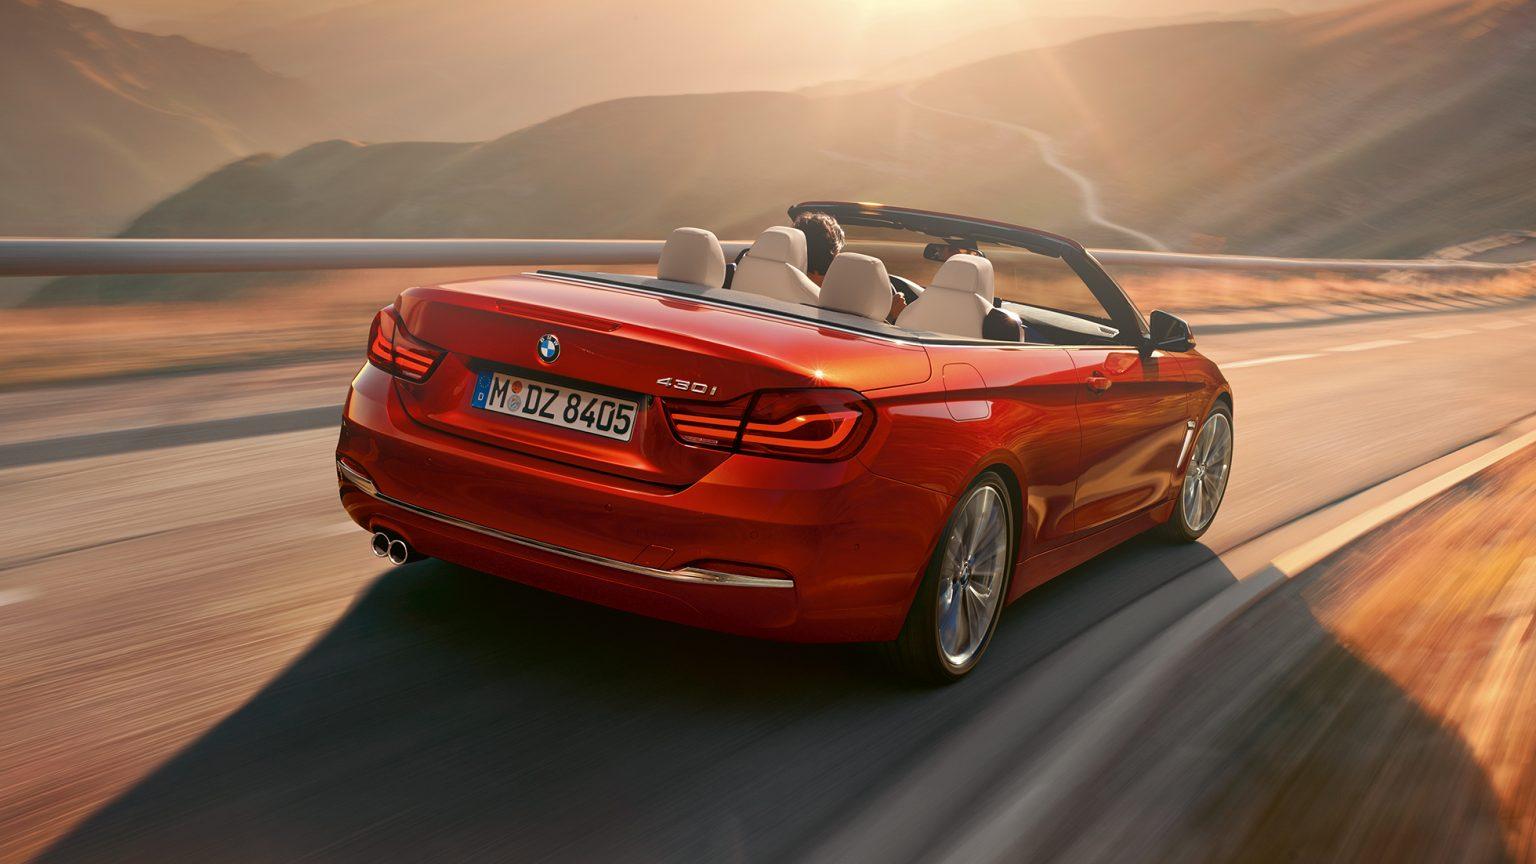 bmw-4-series-convertible-inspire-mg-exterior-interior-design-desktop-01